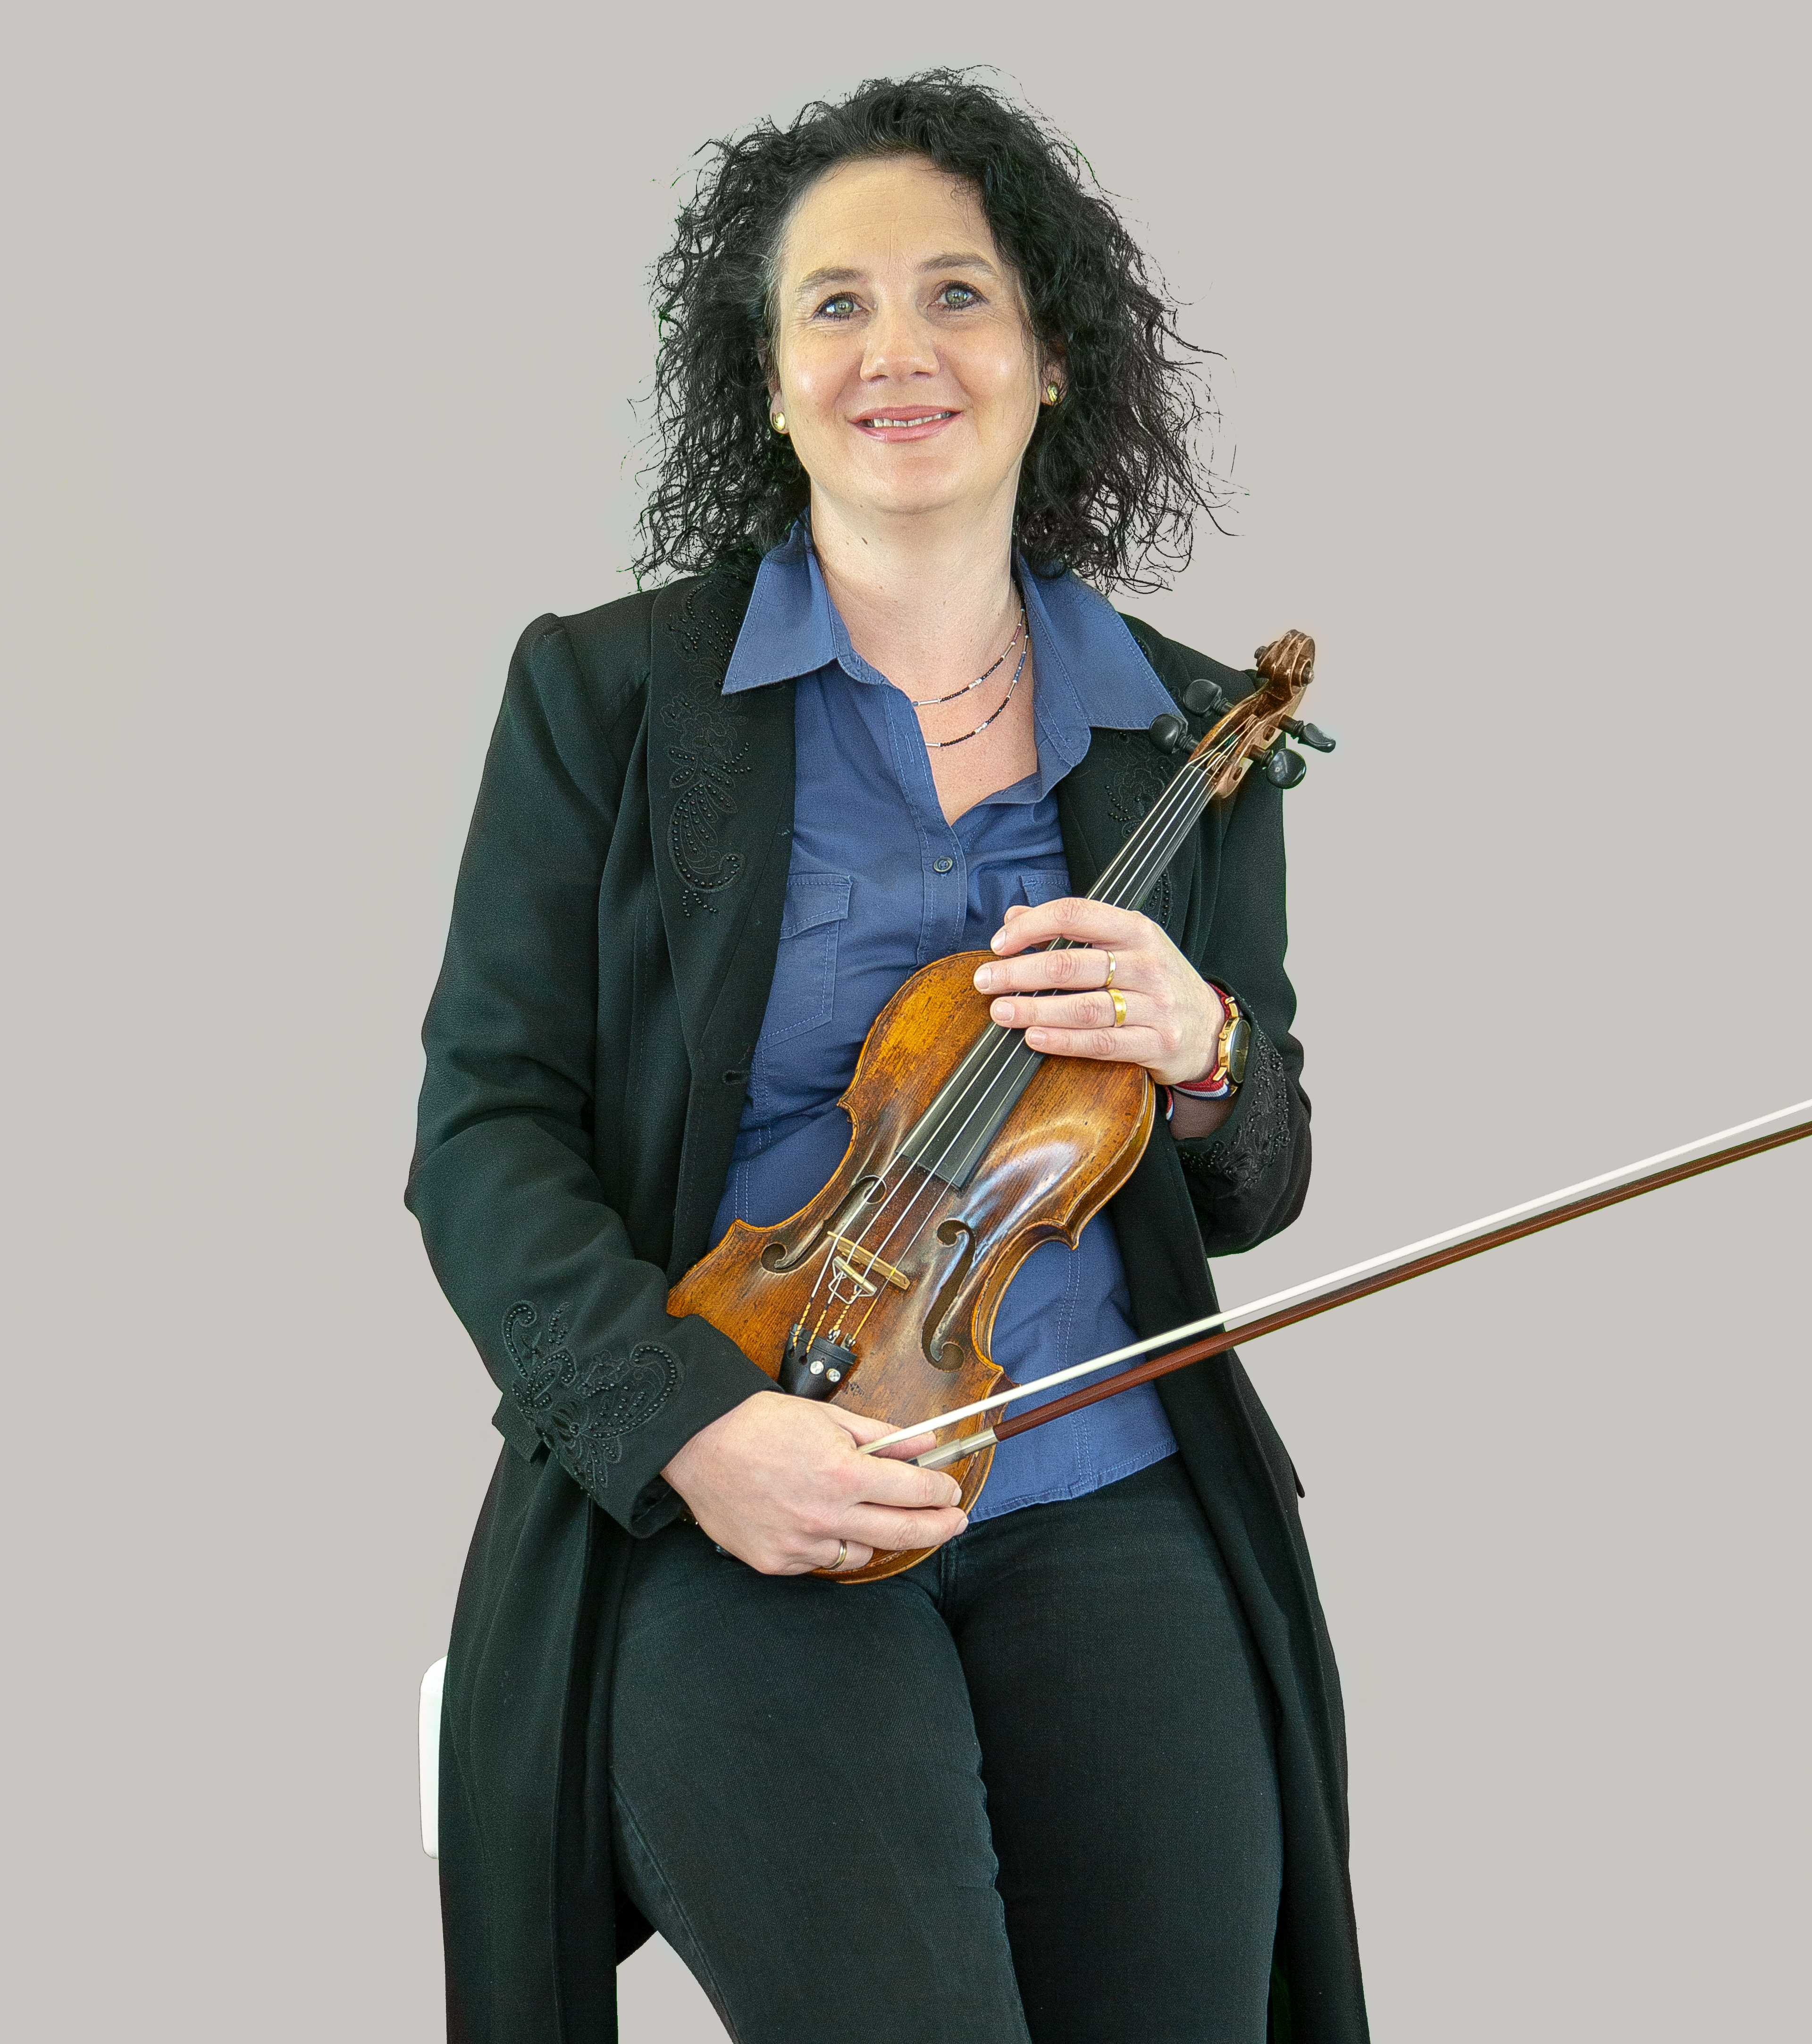 Sabine Kübler